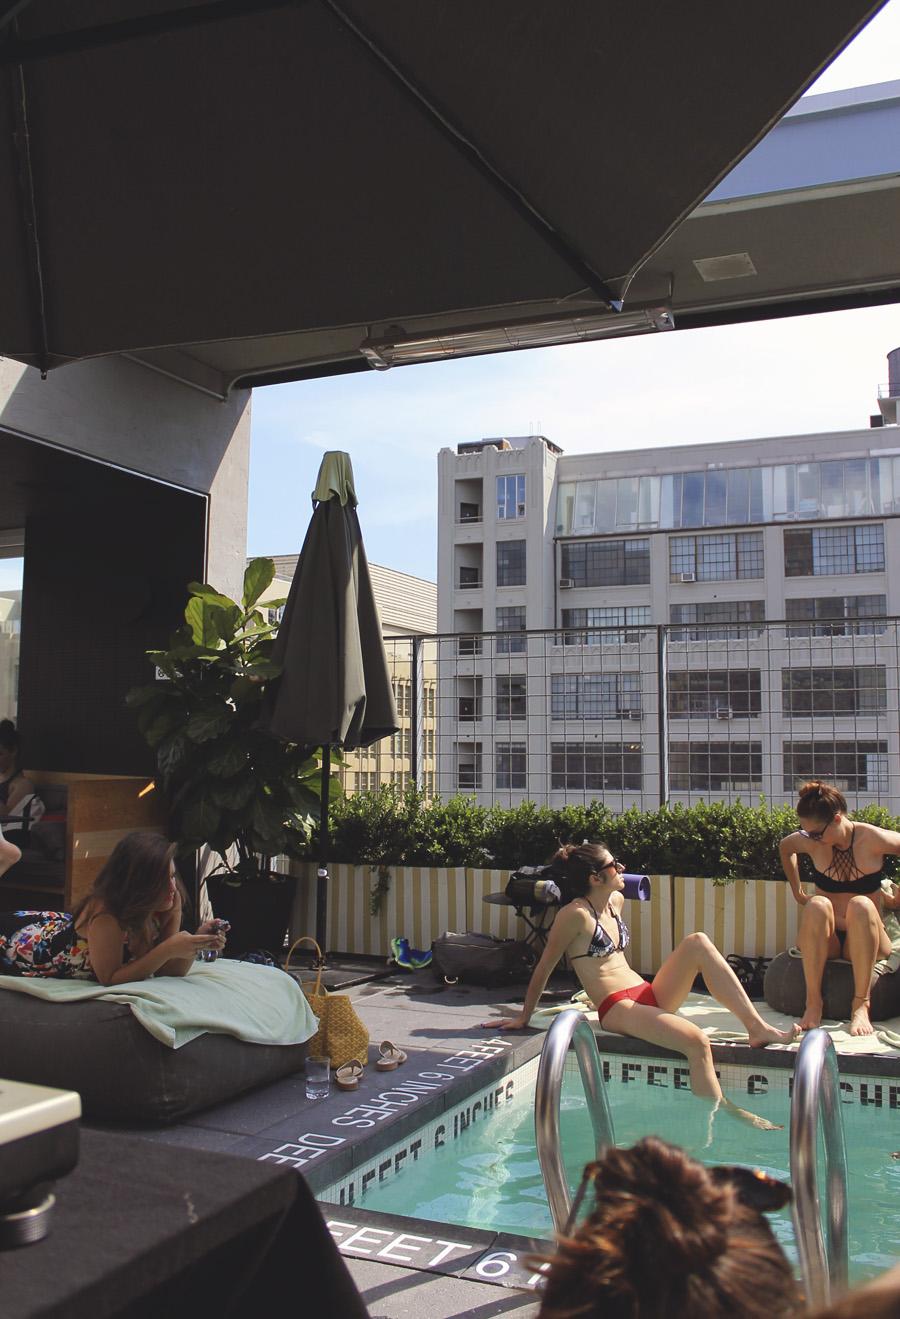 la piscine roof top pool bar chelsea hotel americano grill